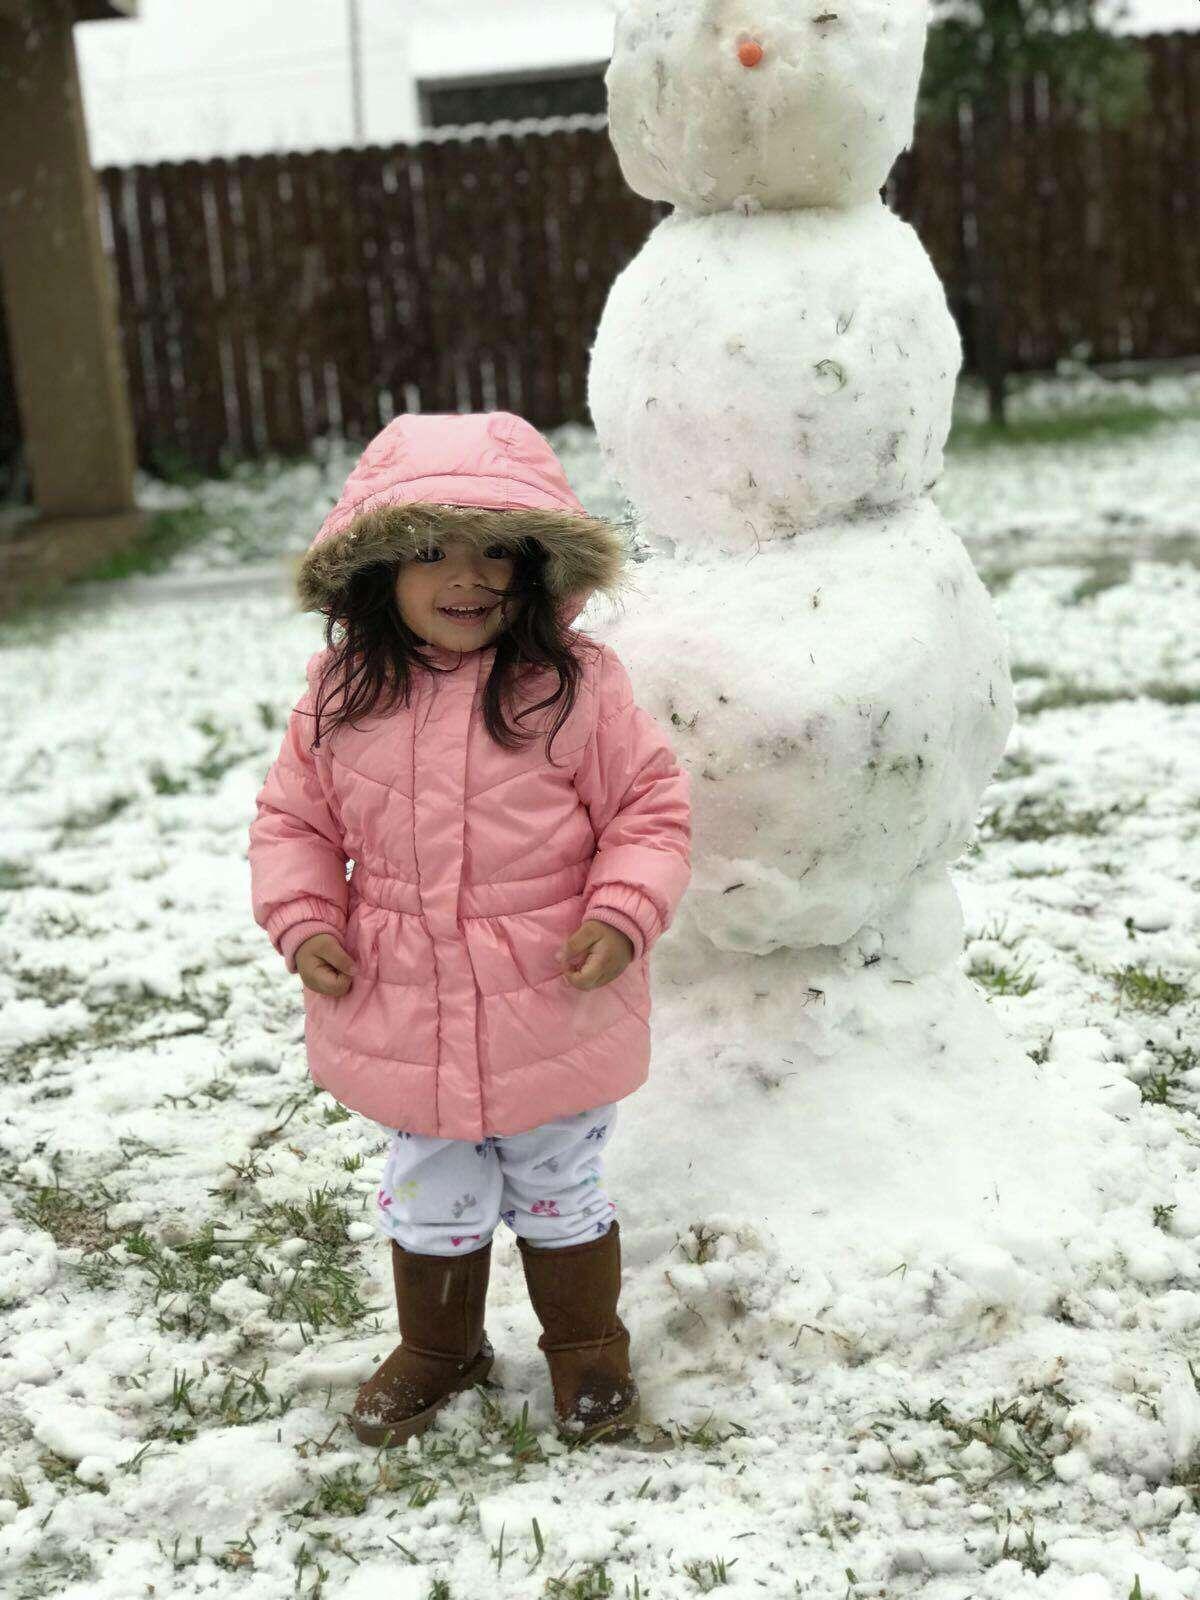 Snow fall hit Eagle Pass, Texas, Thursday, Dec. 7, 2017.